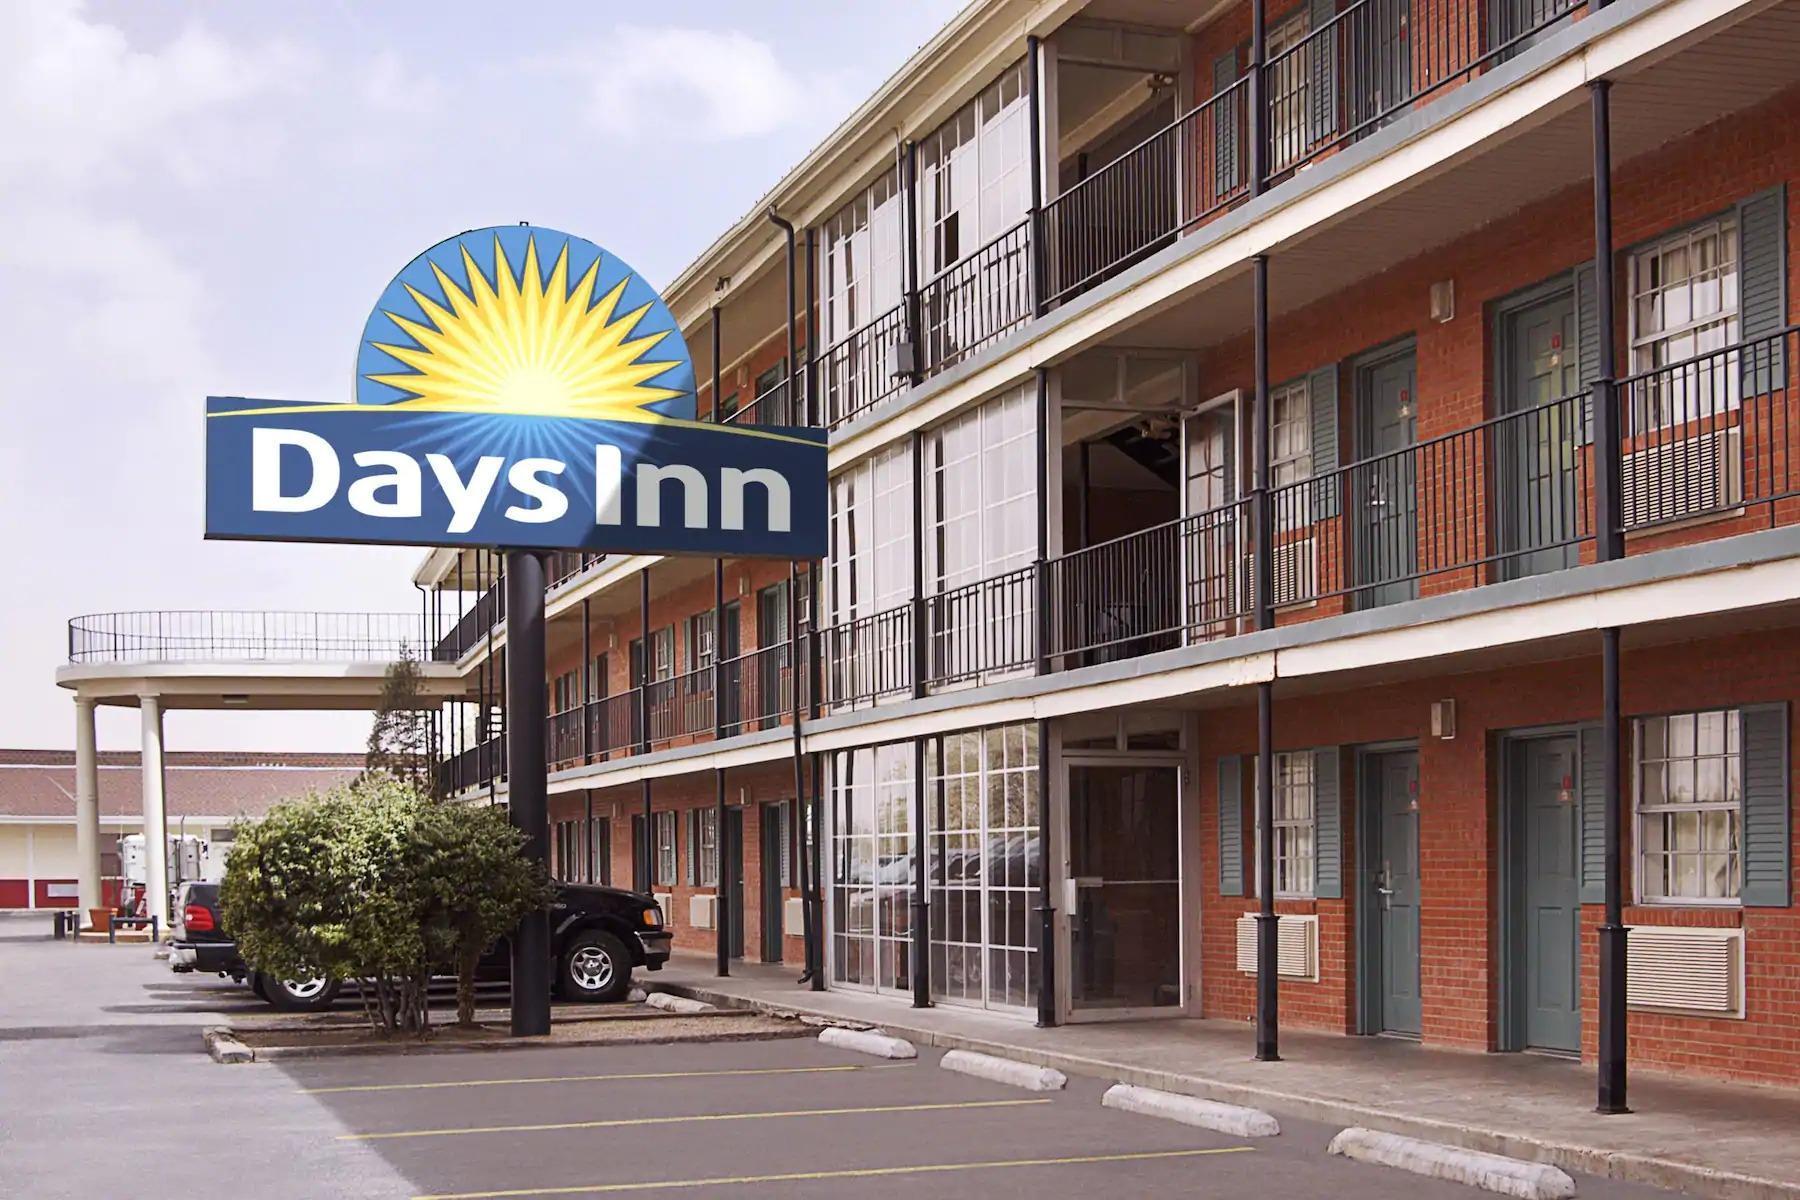 Days Inn Lubbock Texas Tech University